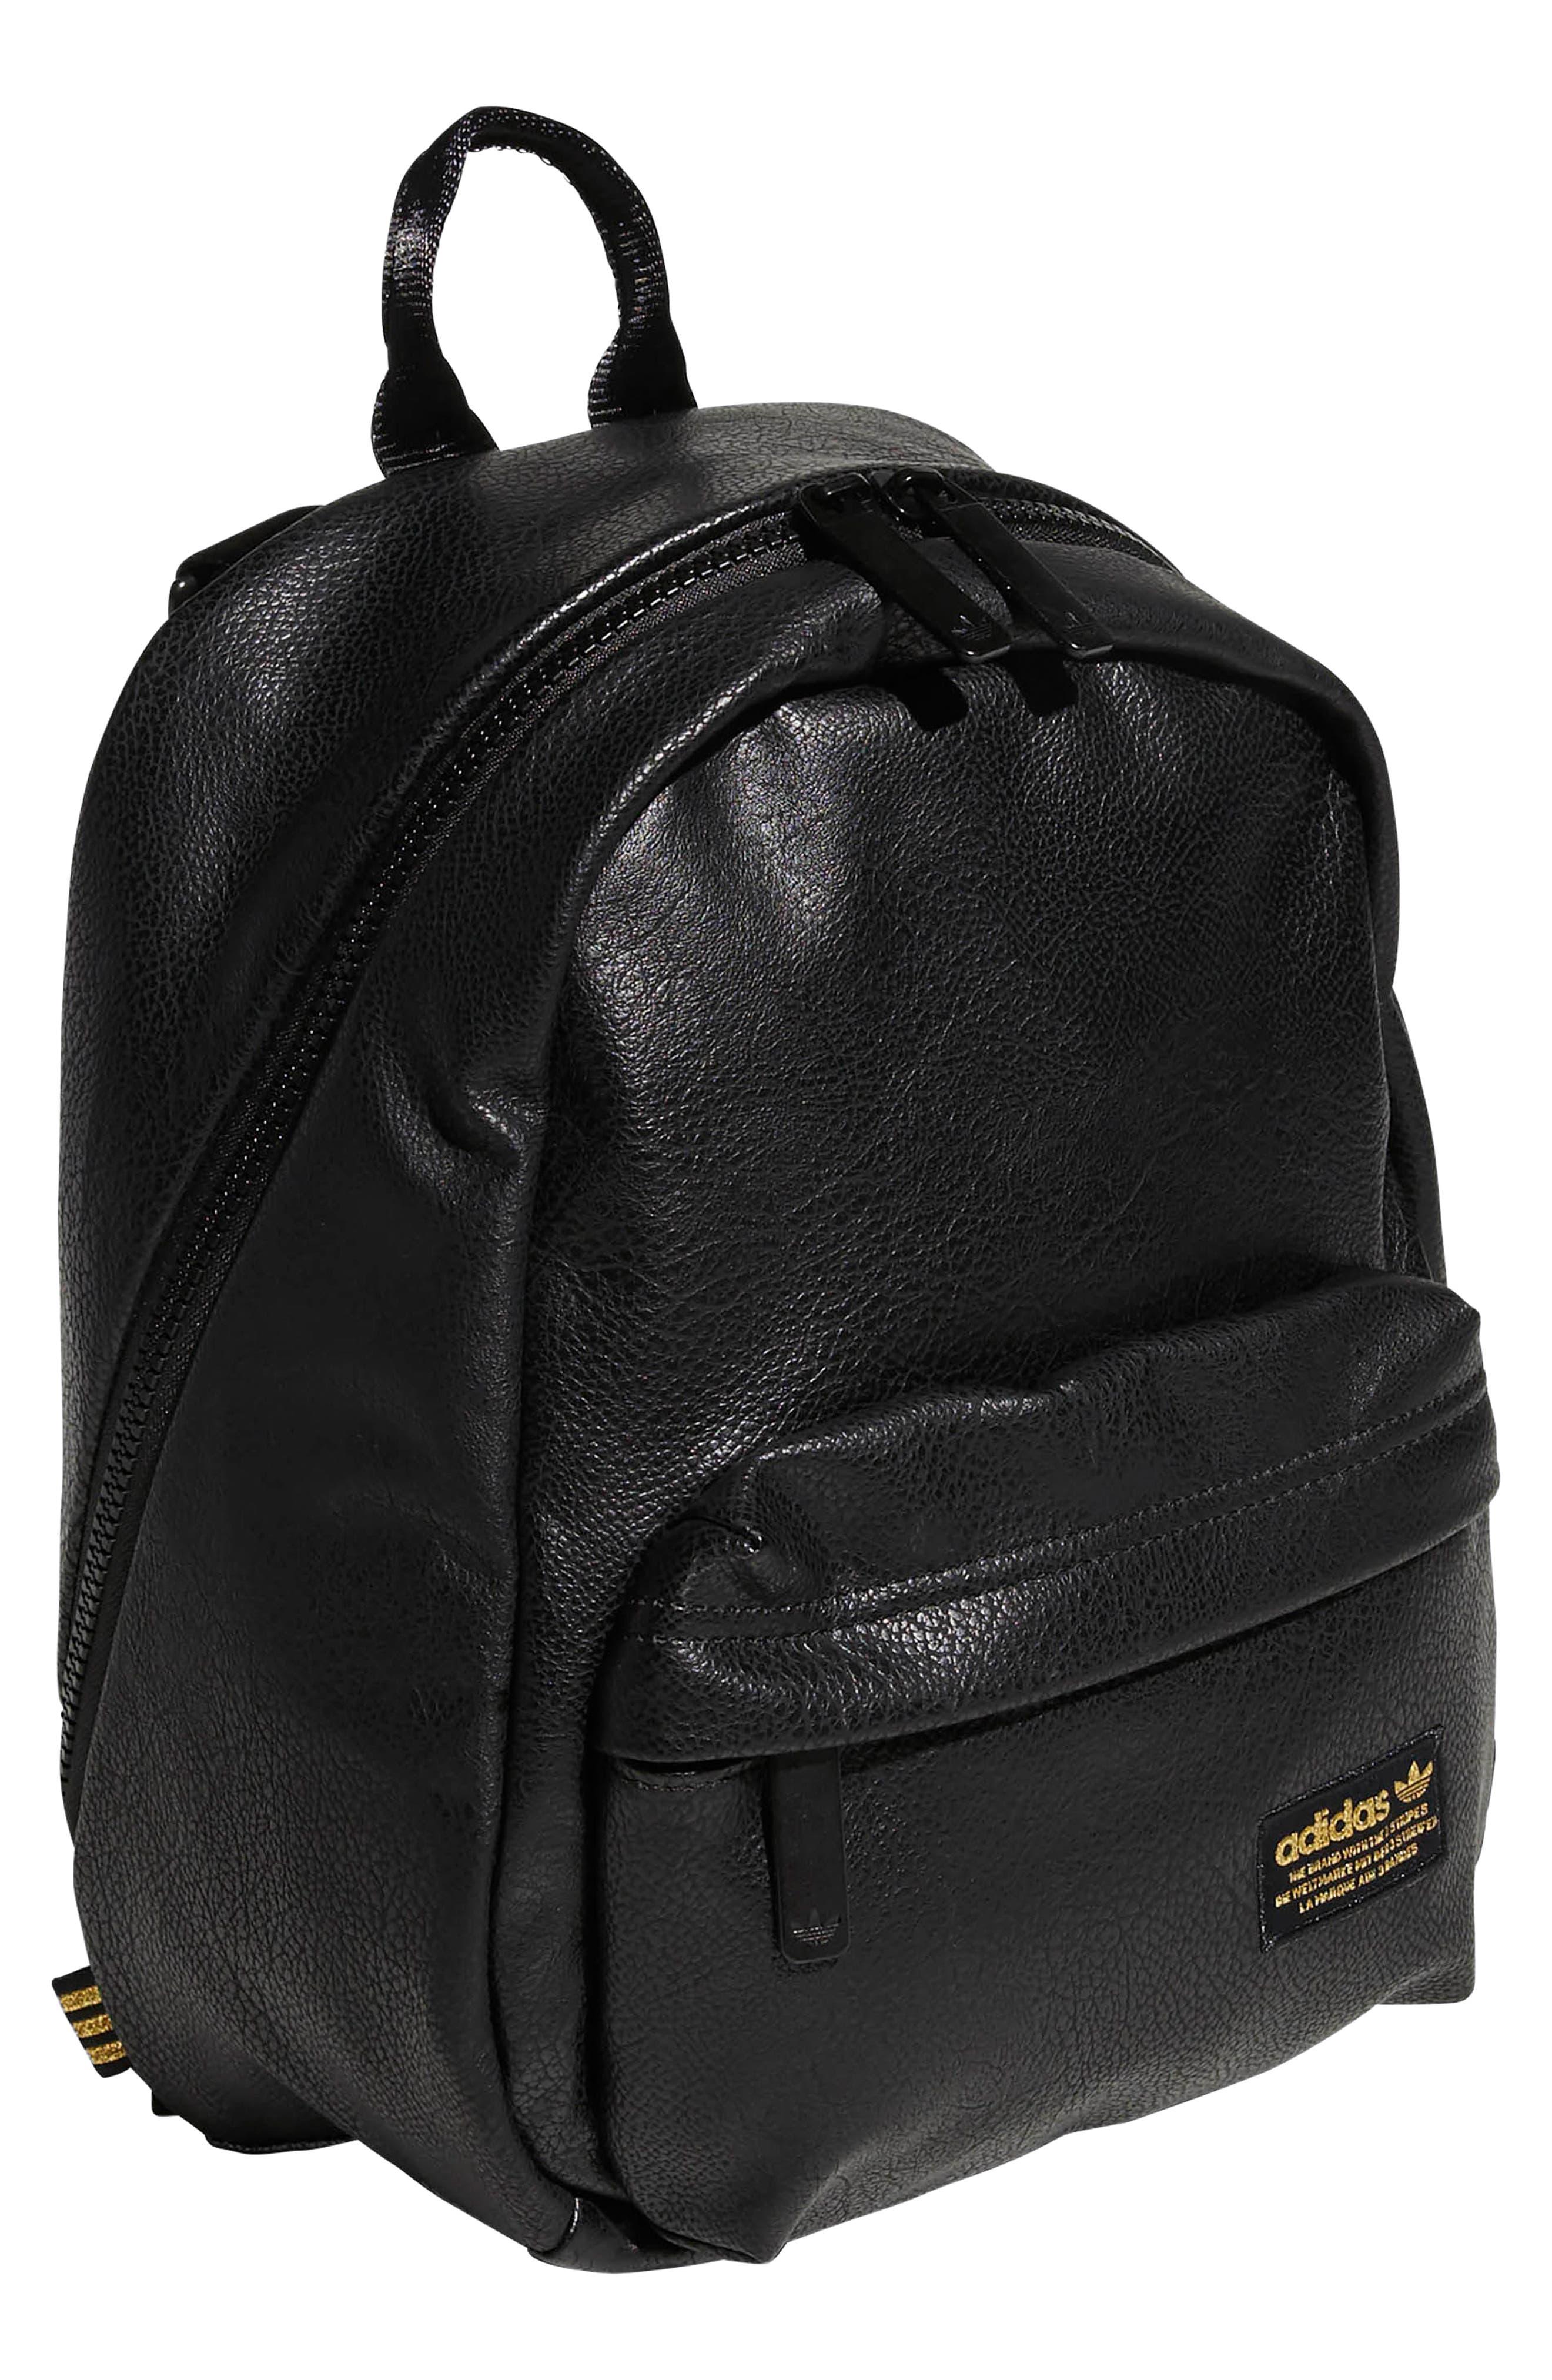 ADIDAS ORIGINALS, National Compact Backpack, Alternate thumbnail 4, color, 001